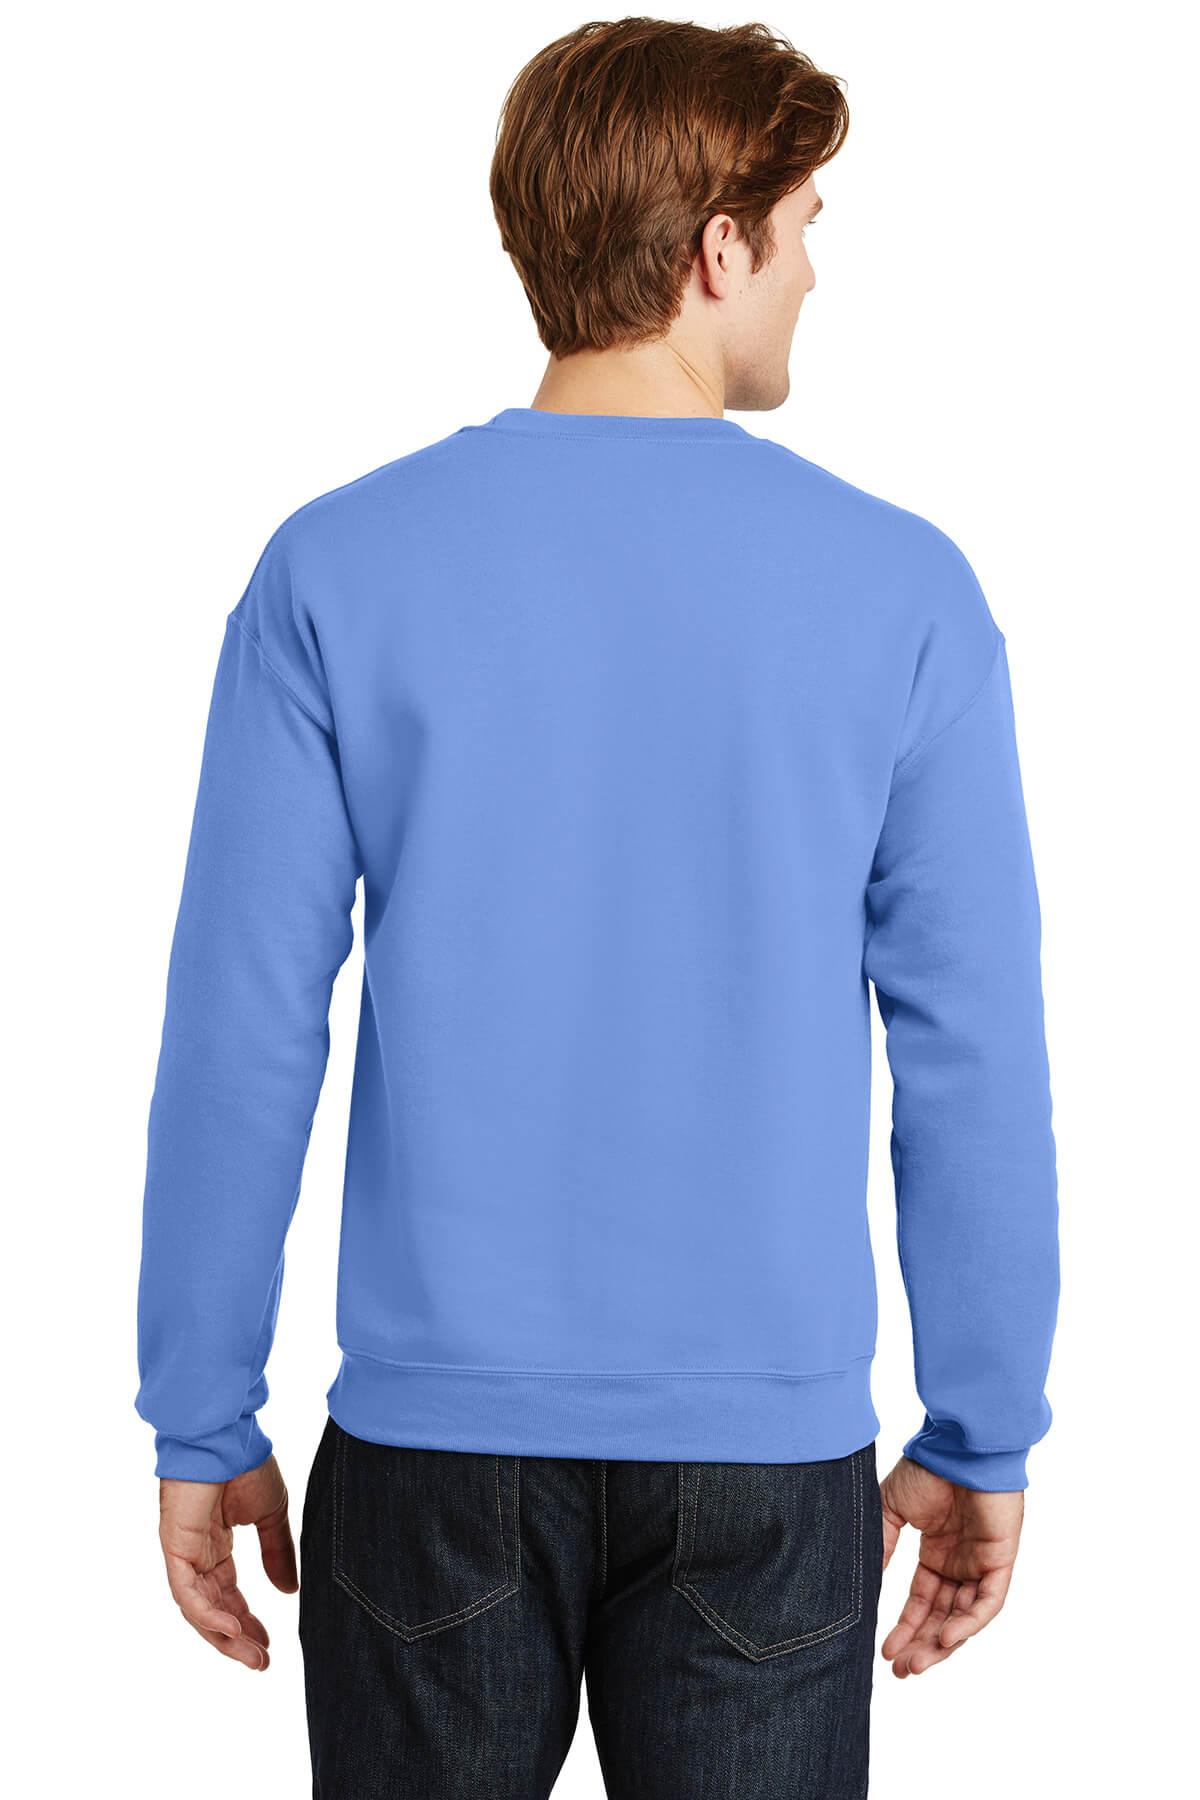 18000-carolina-blue-2